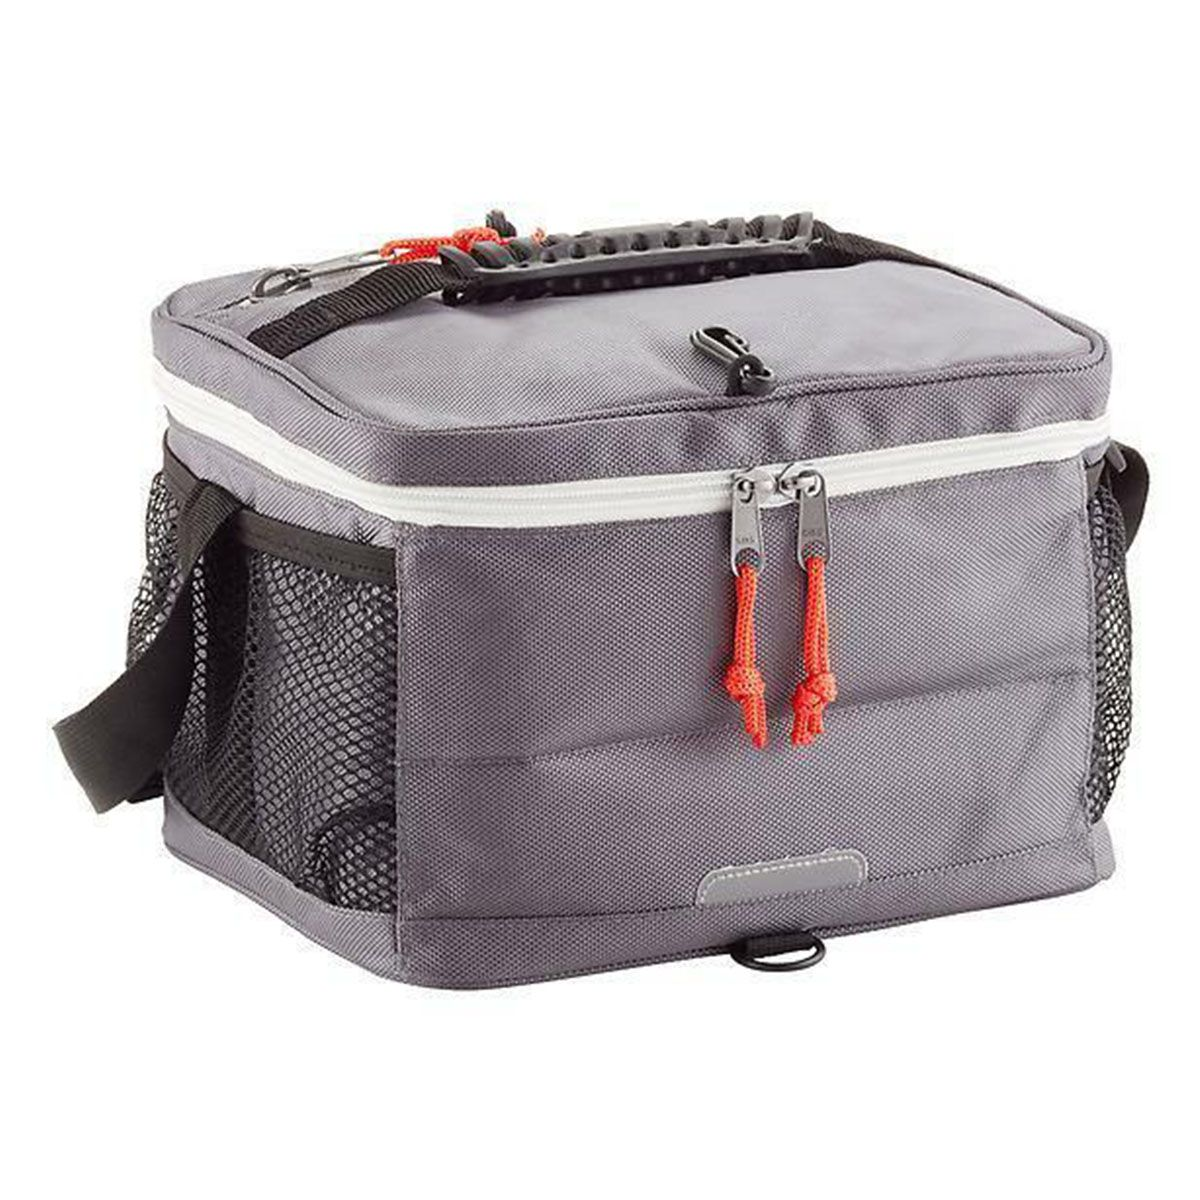 Paradiso Cooler Bag 6 Can